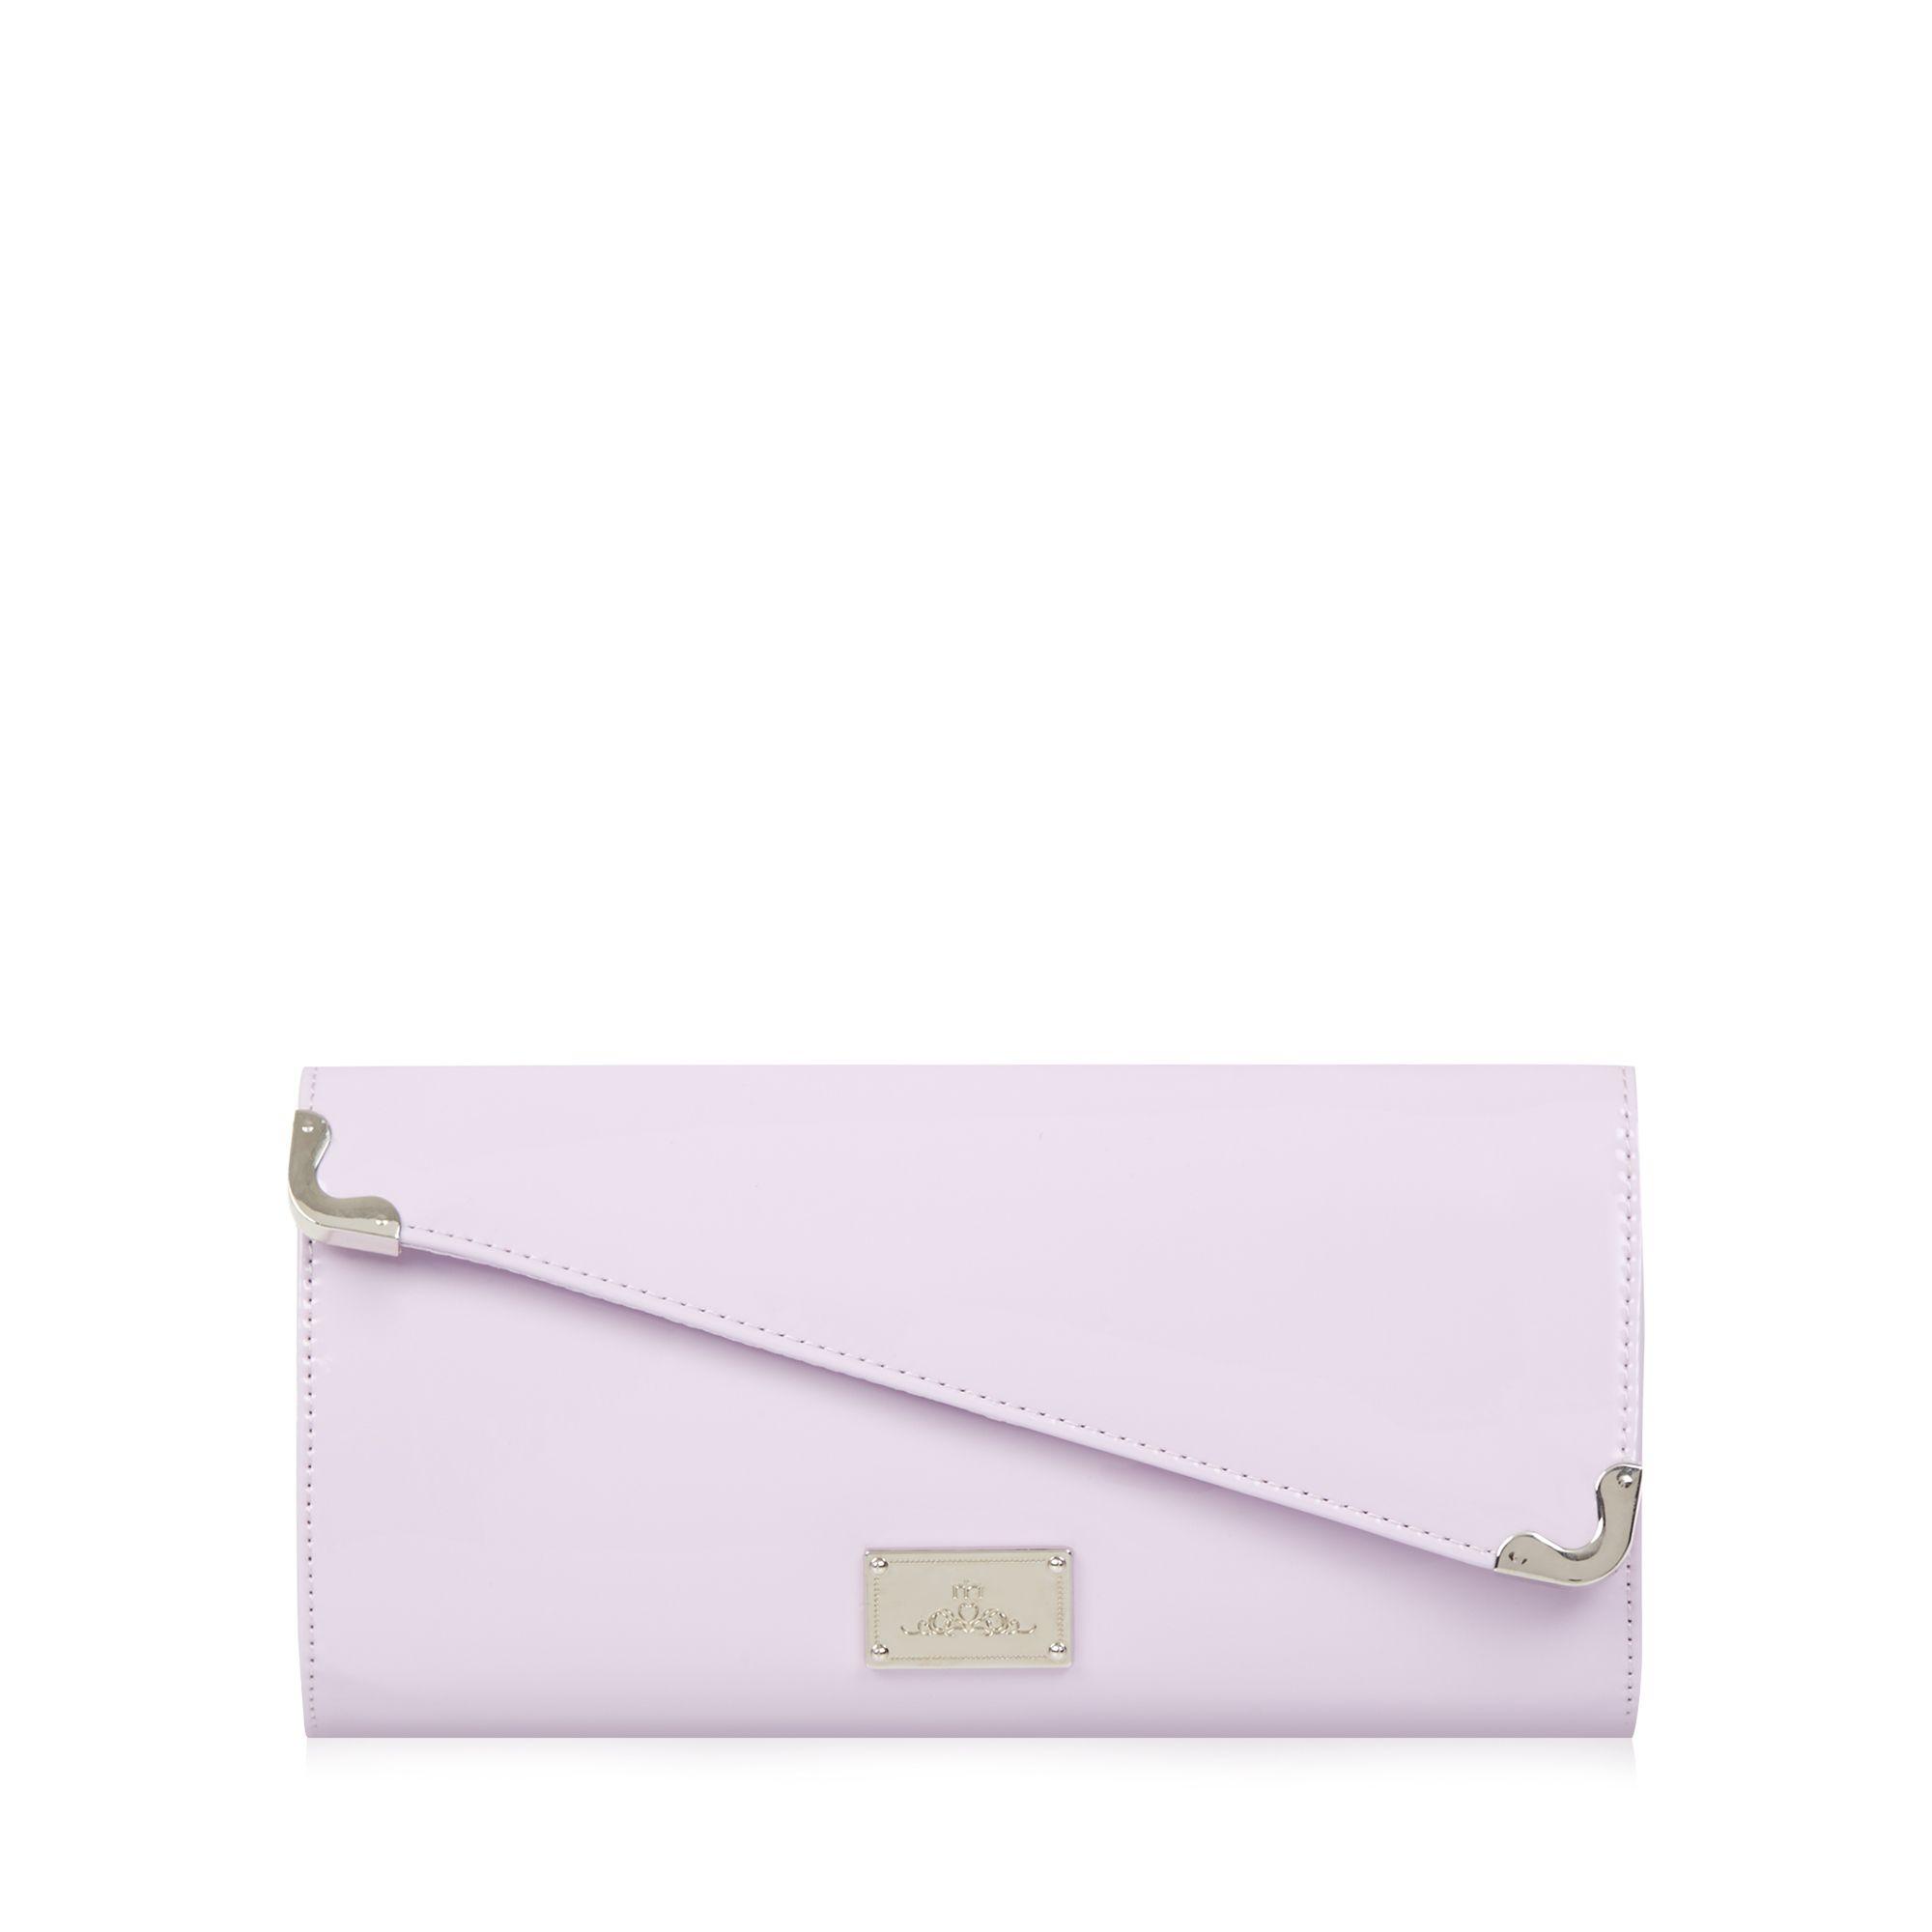 Red Herring Womens Lilac Patent Asymmetric Clutch Bag From Debenhams | EBay